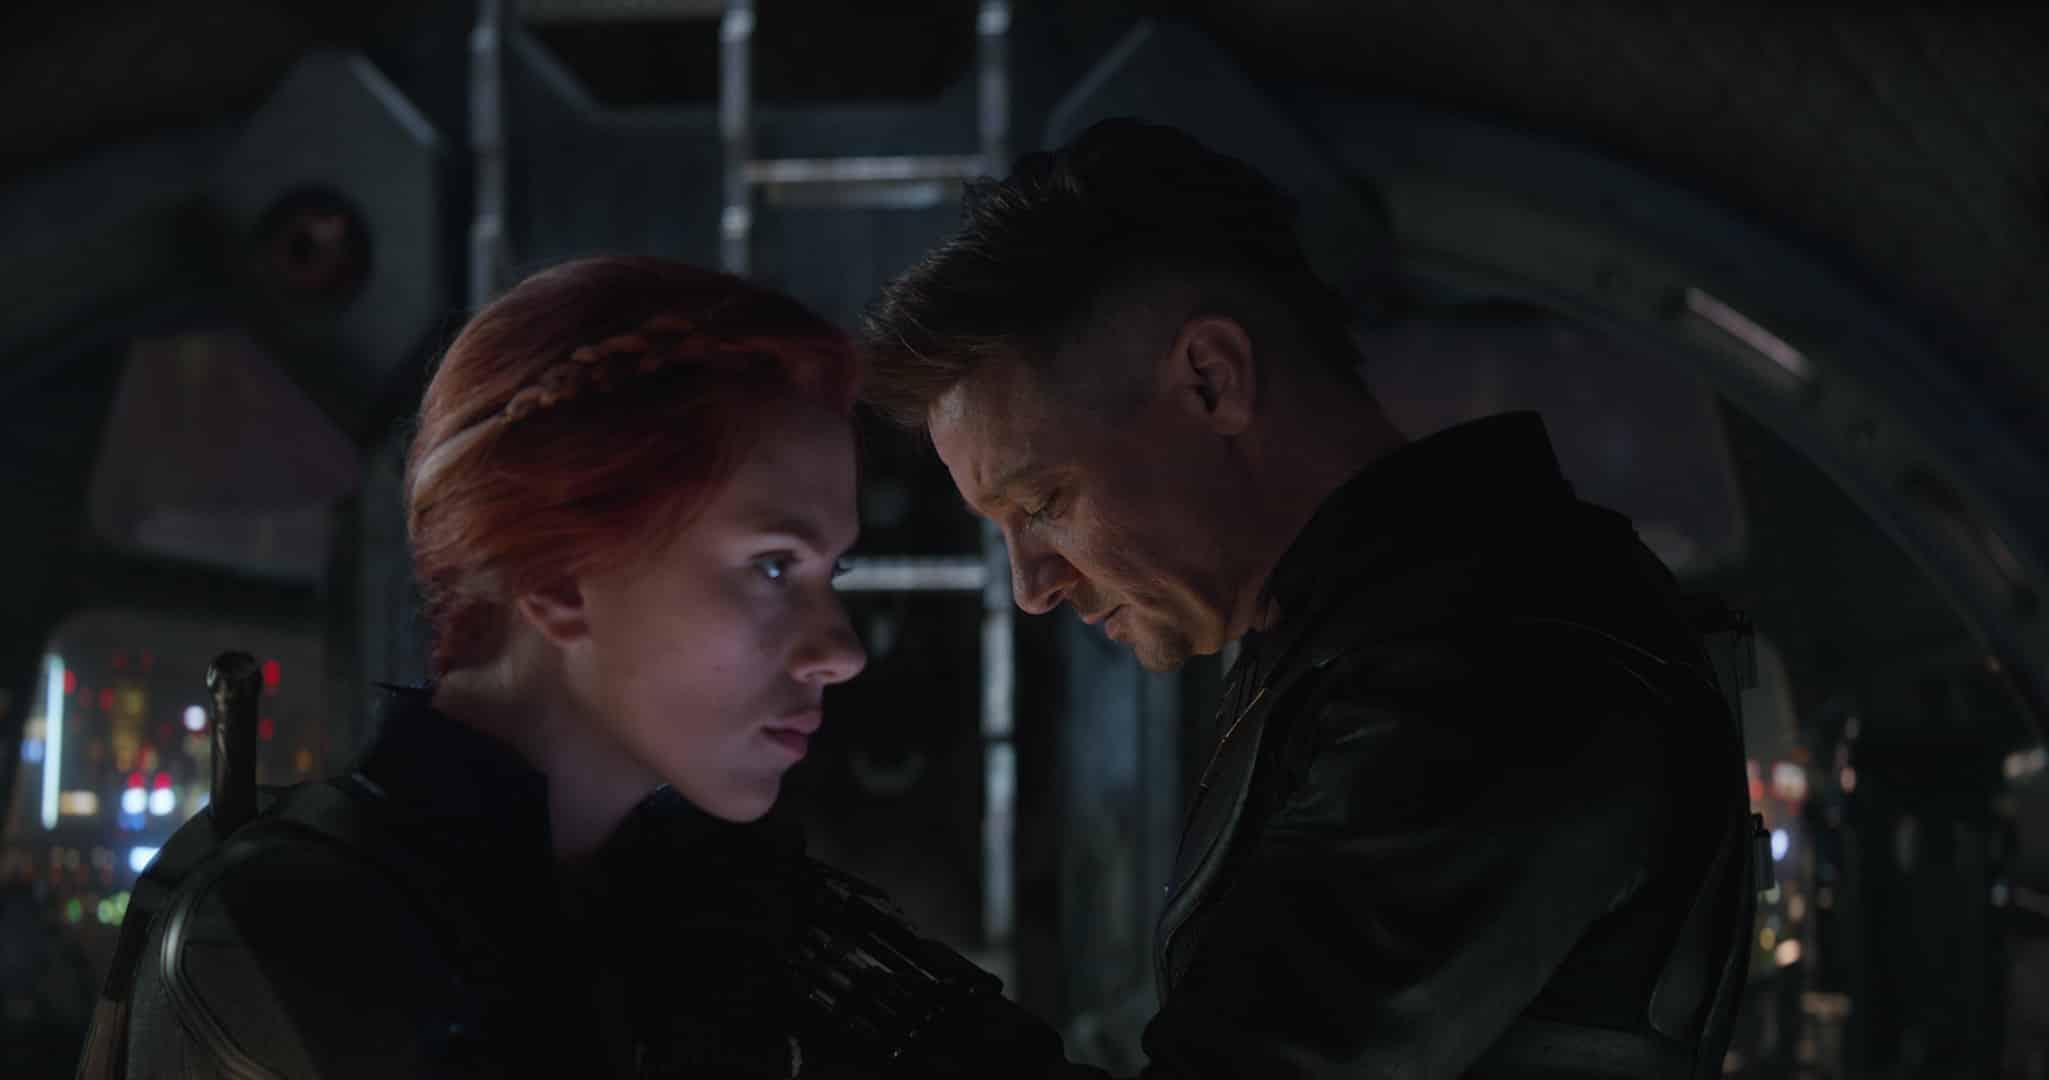 Scarlett Johansson as Natasha Romanoff and Jeremy Renner as Clint Barton in Avengers: Endgame